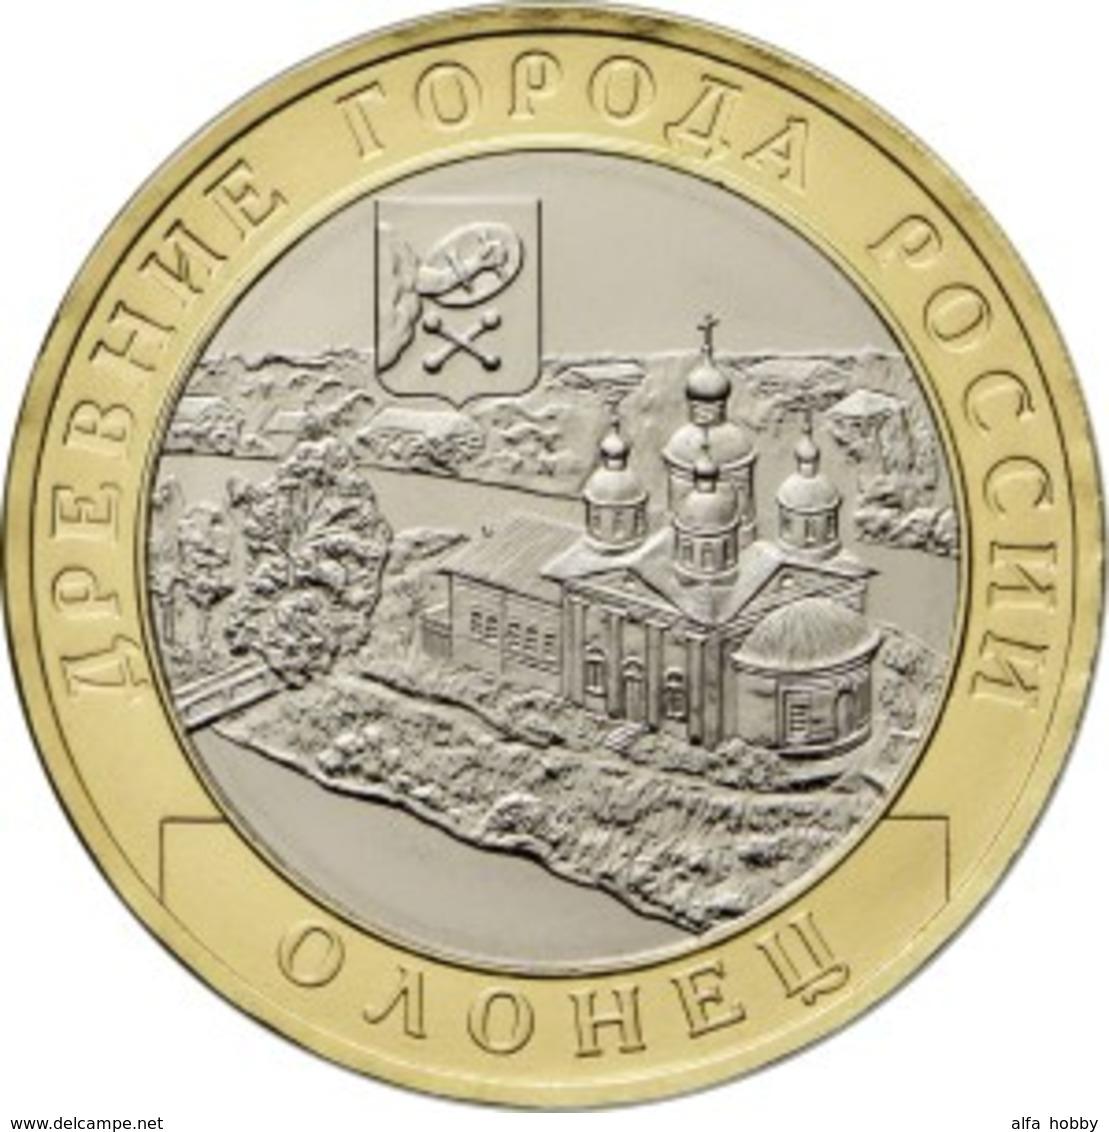 Russia, Olonets, The Republic Of Karelia, 2017 10 Rbl Rubels Rubles Bi-metallic Uncirculated - Russia